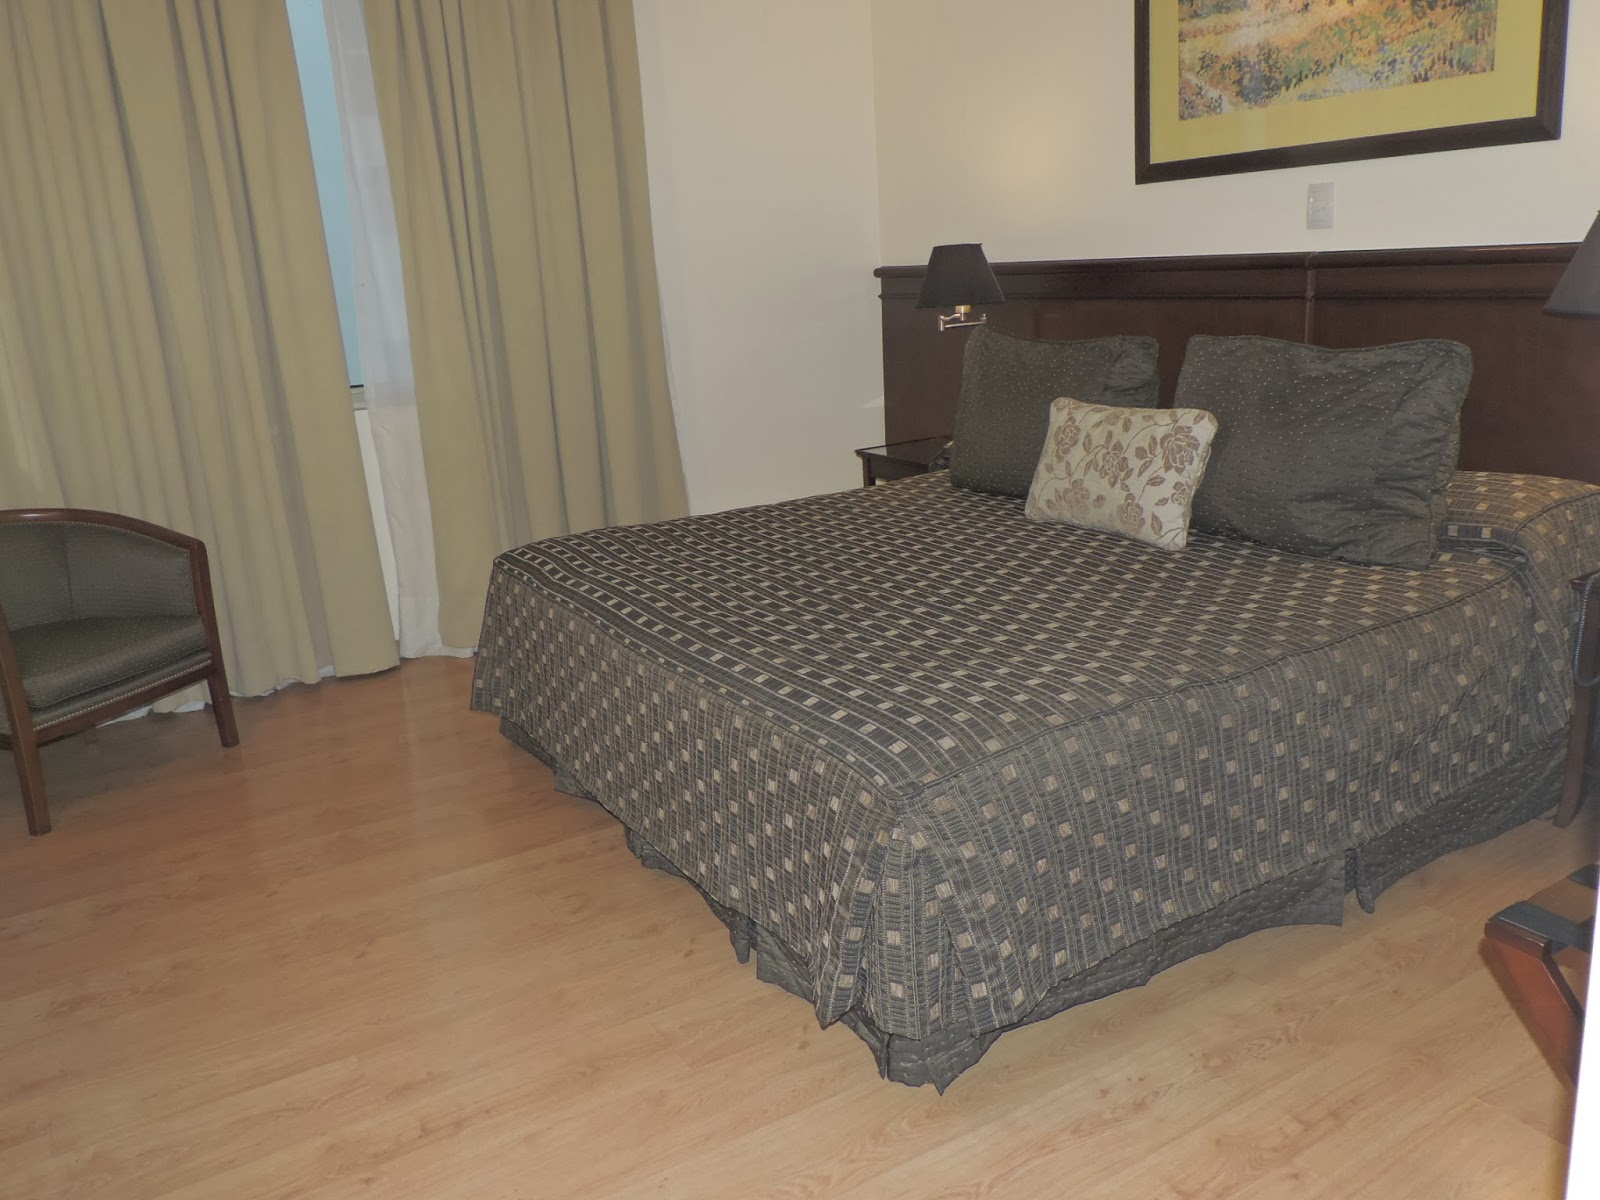 Blog Apaixonados por Viagens: Mendoza: Hotel Amerian Executive #80684B 1600 1200